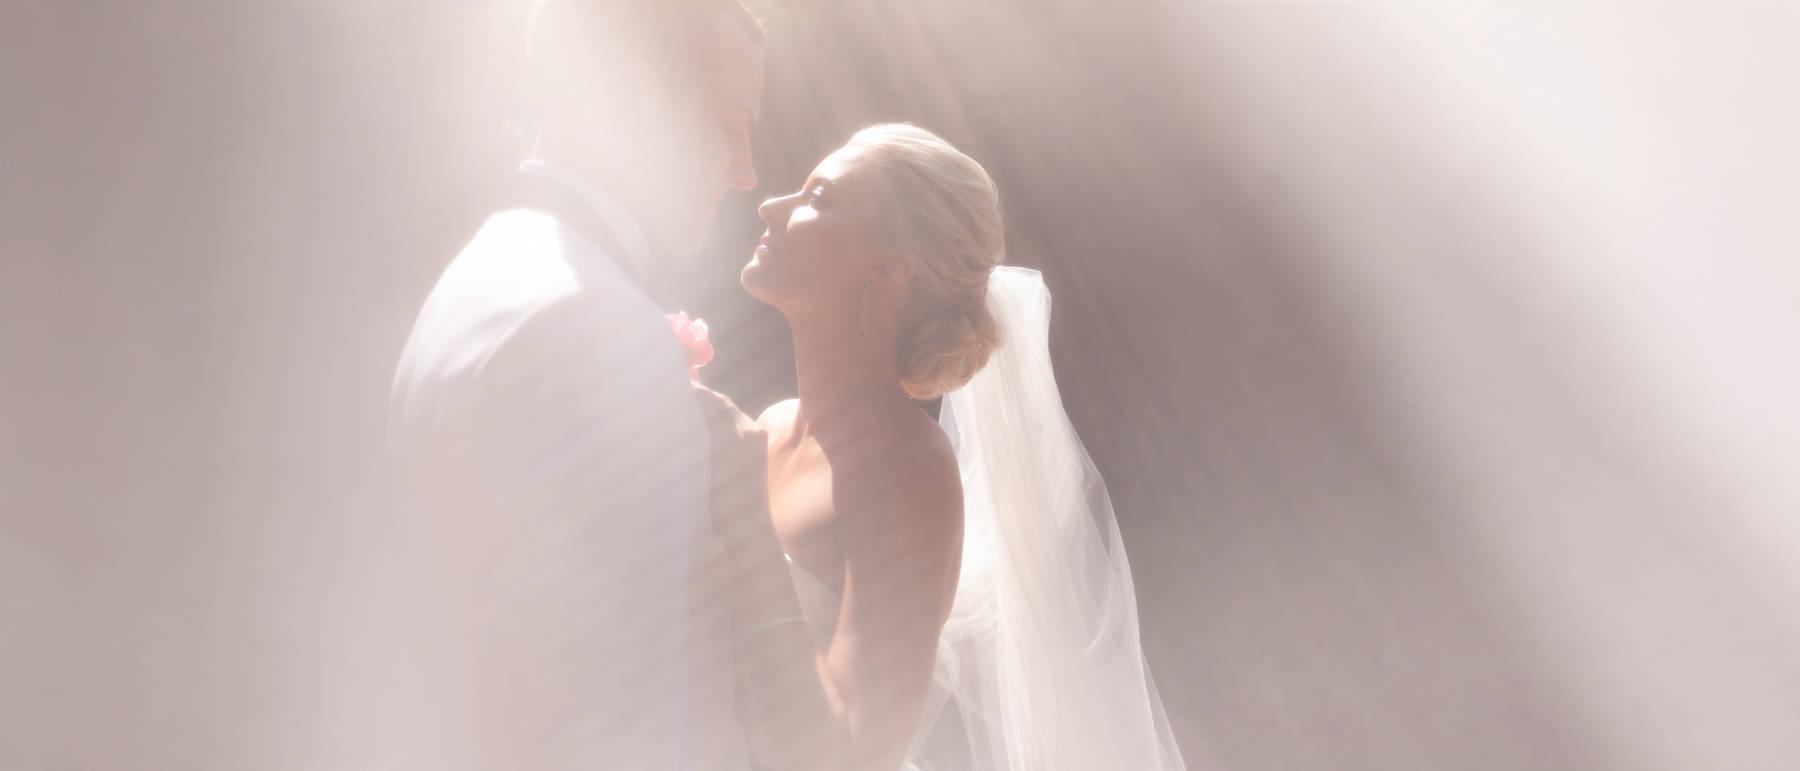 johnandjoseph-wedding-photographer-hz-slider-134